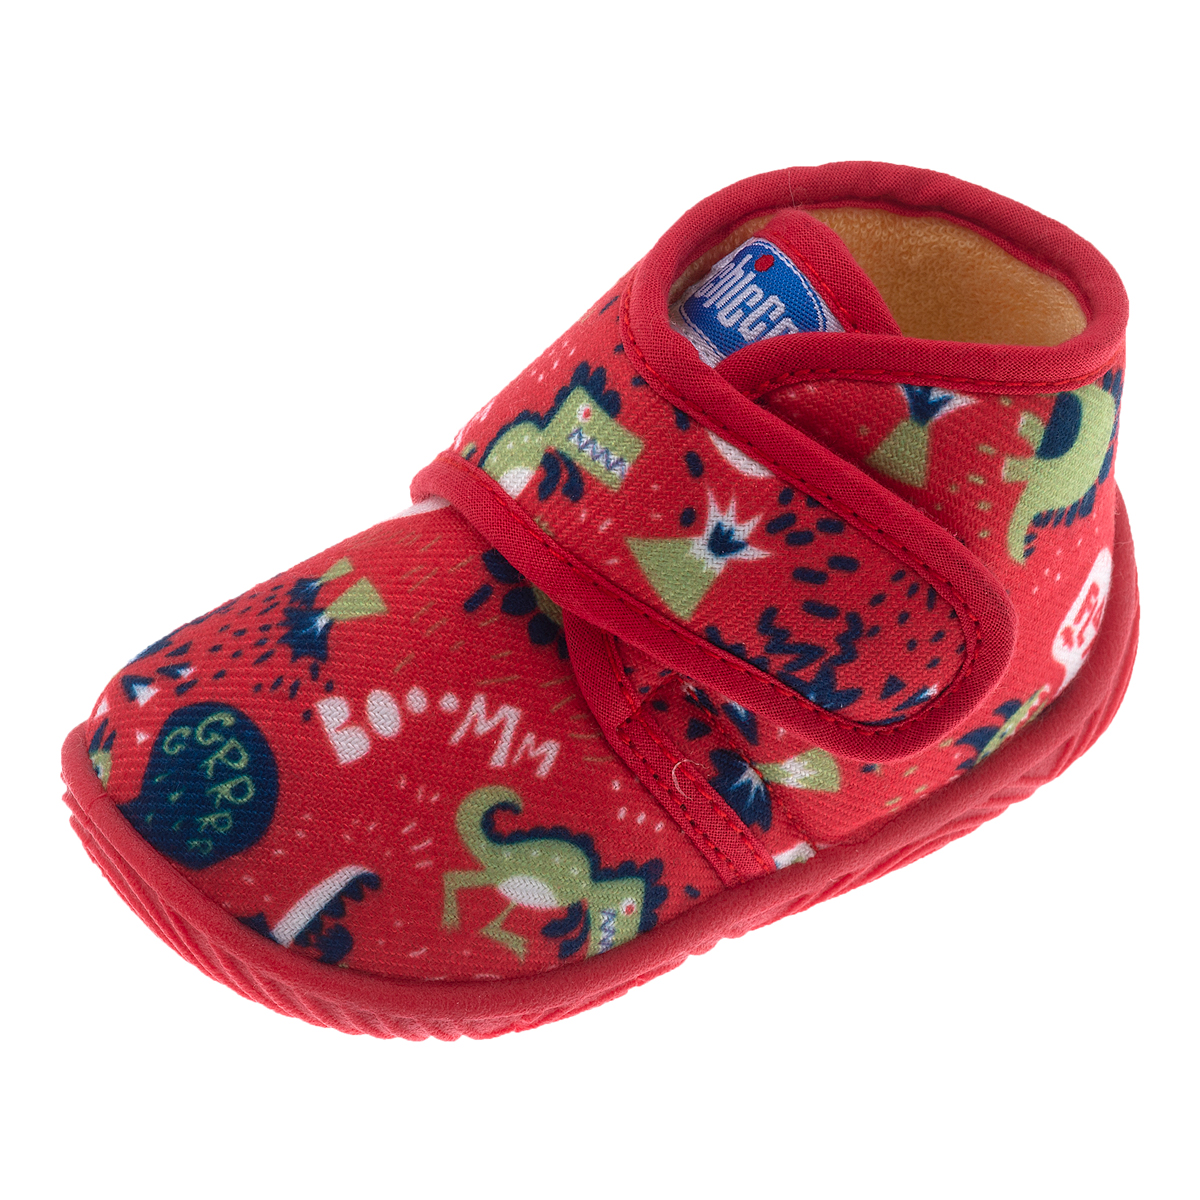 Pantofi De Casa Chicco Tamigi, Rosu Cu Model, 60723 imagine